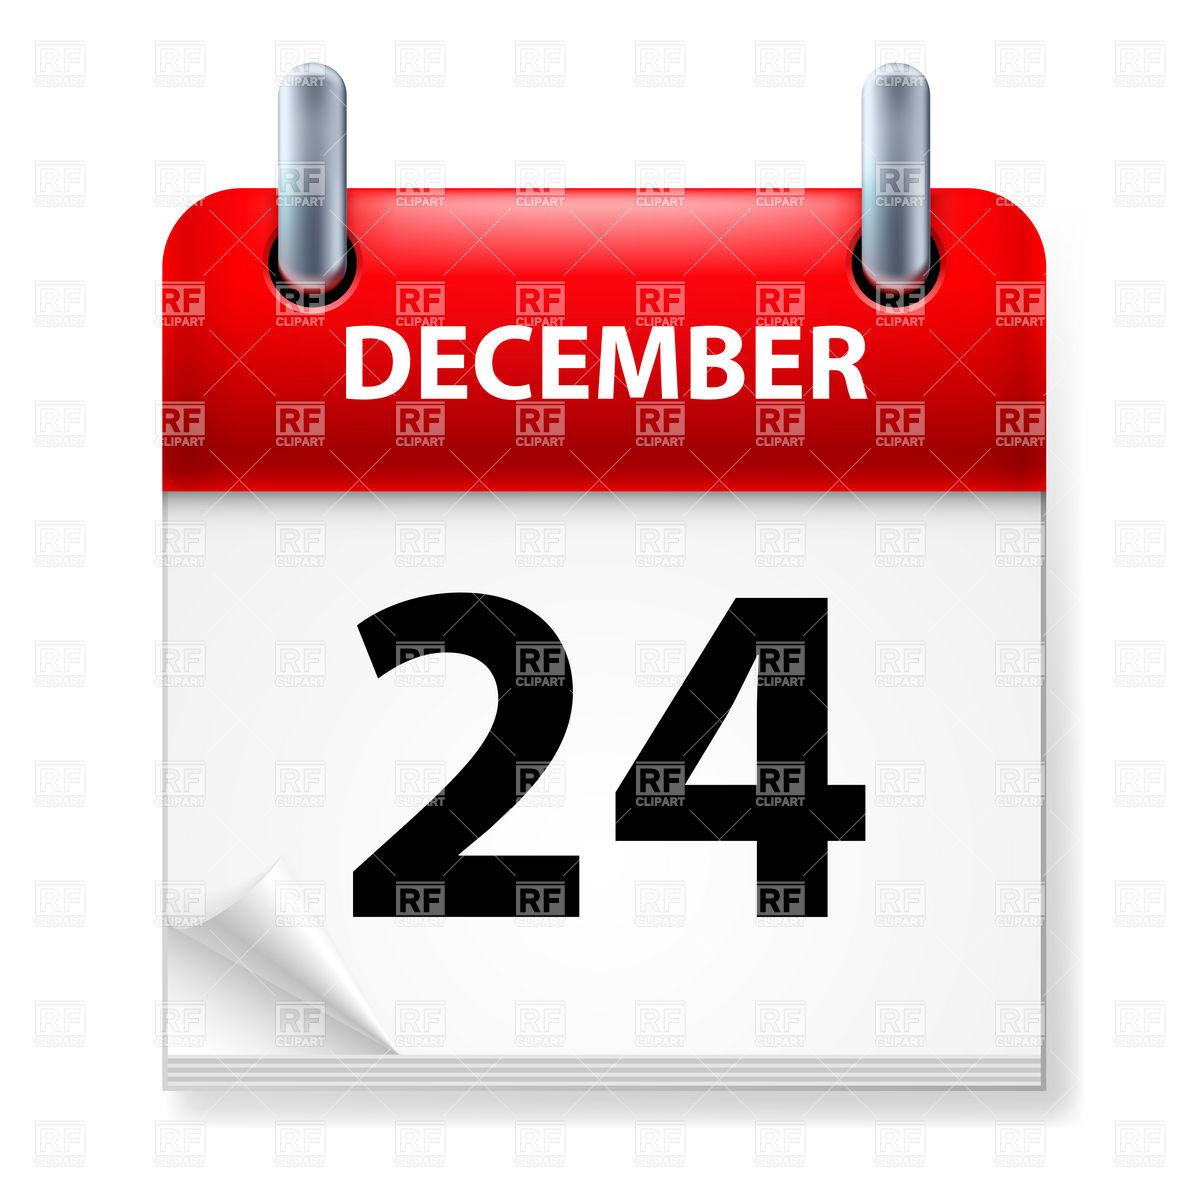 Calendar clipart december 24 vector black and white library Calendar clipart december 24 - ClipartFest vector black and white library